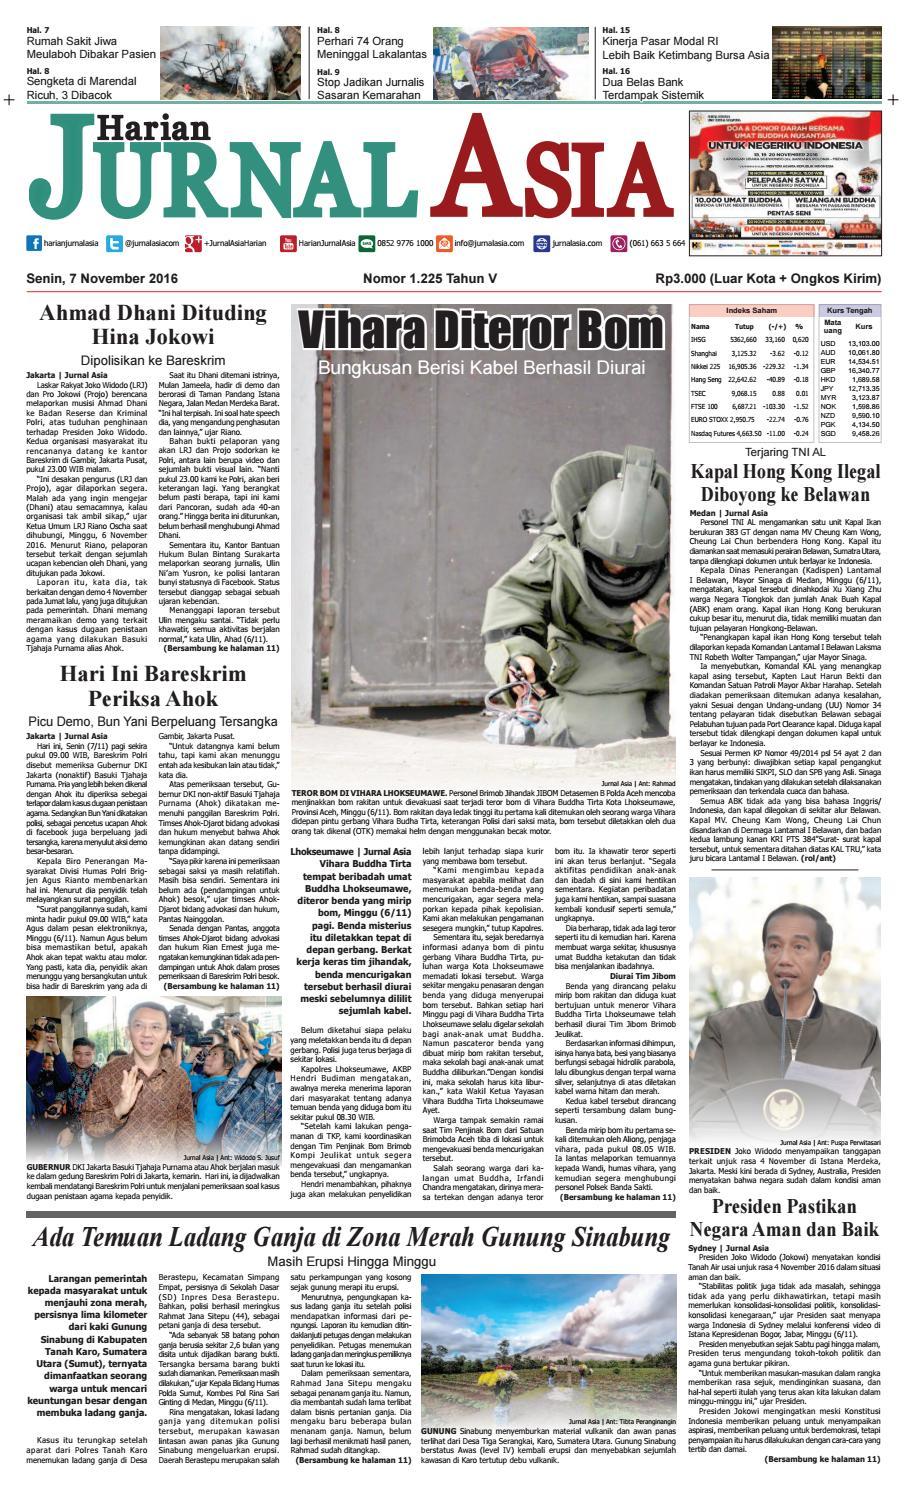 Harian Jurnal Asia Edisi Senin, 07 November 2016 by Harian Jurnal Asia - Medan - issuu